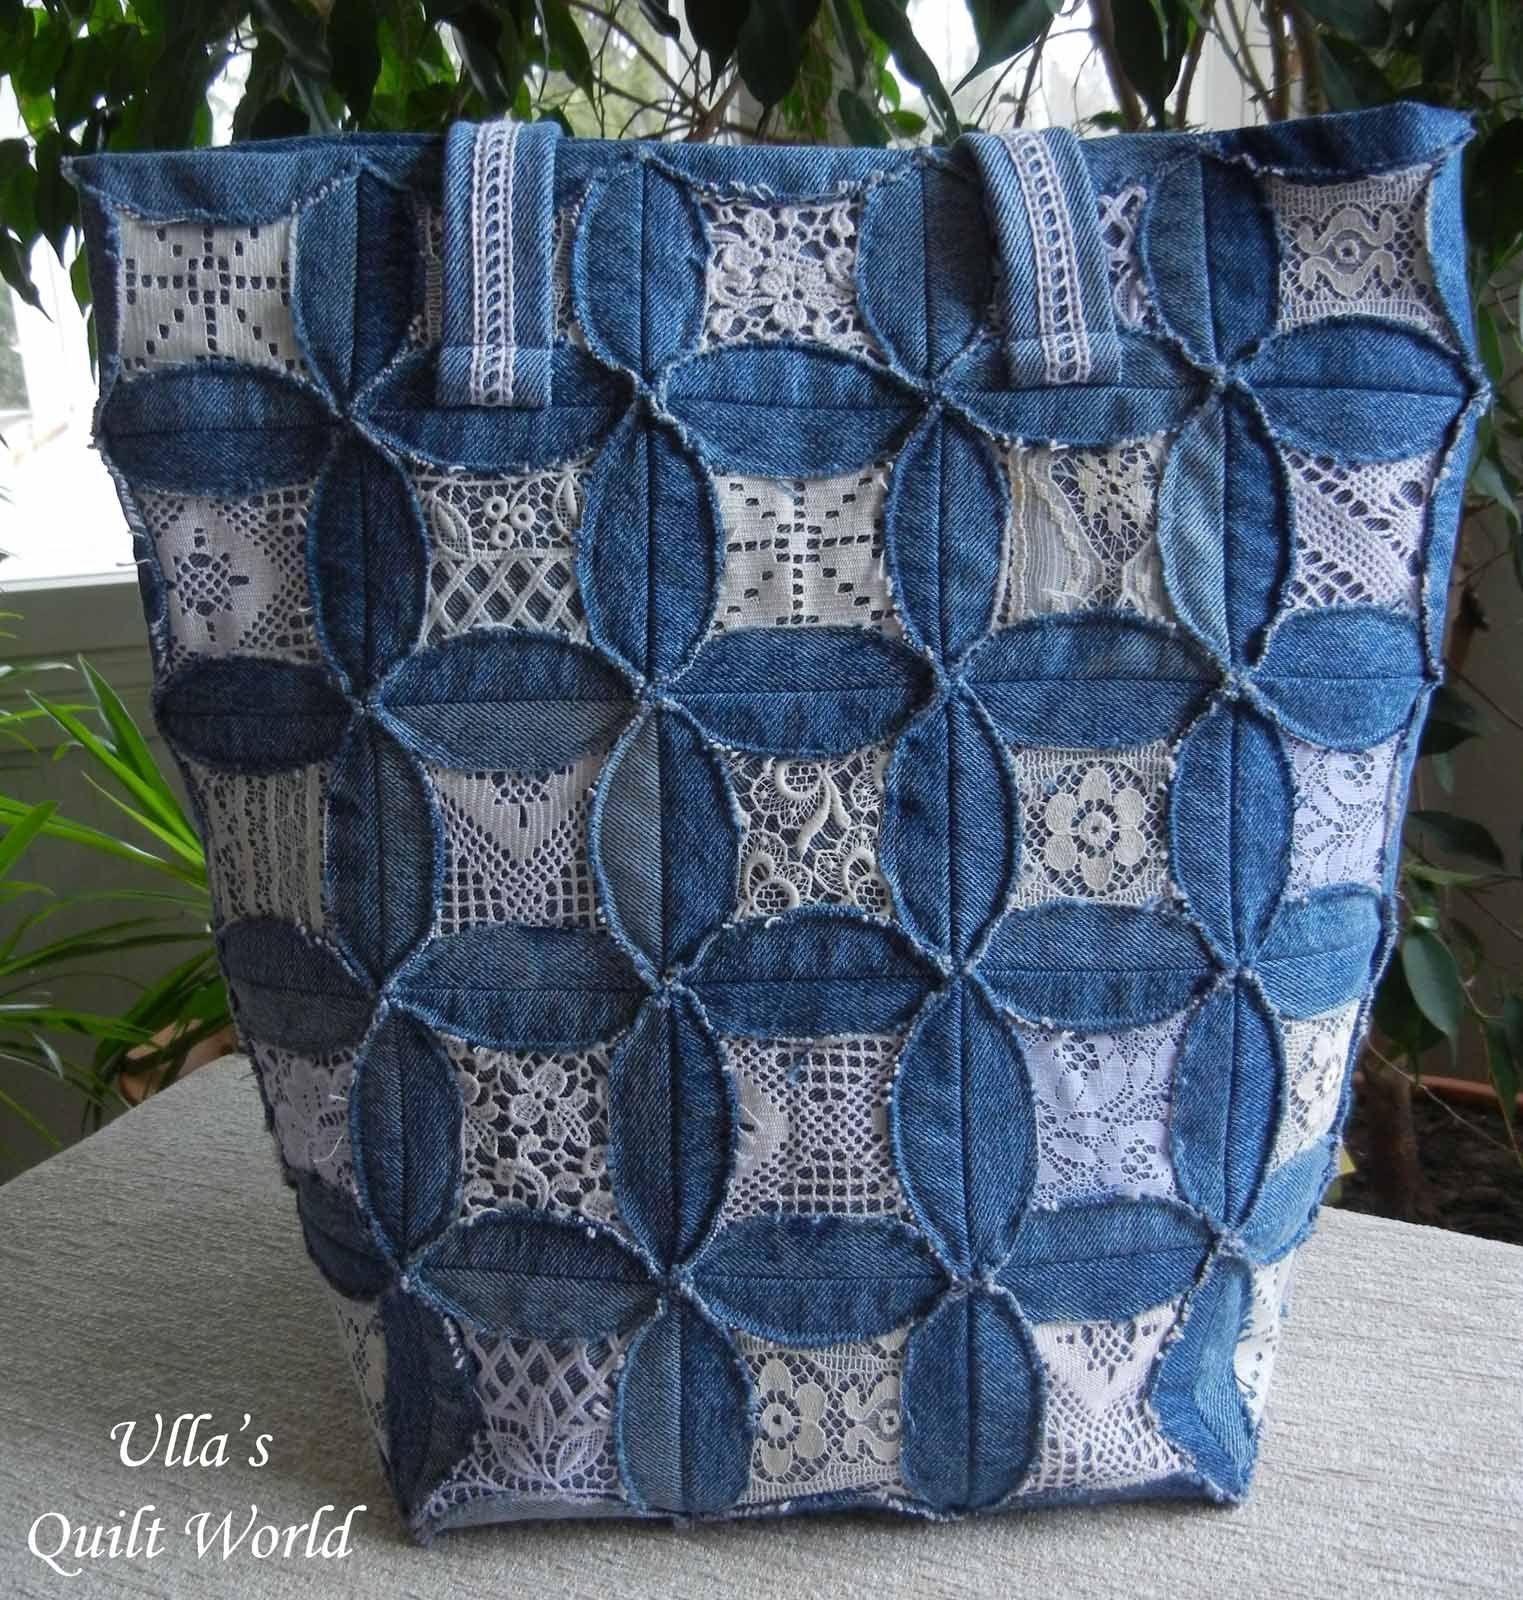 The denim quilt bag: Diameter of a circle is 11 cm and Square is 7,3 cm. Circle: 4,3 inches and Square: 2,9 inches.                Cathe...